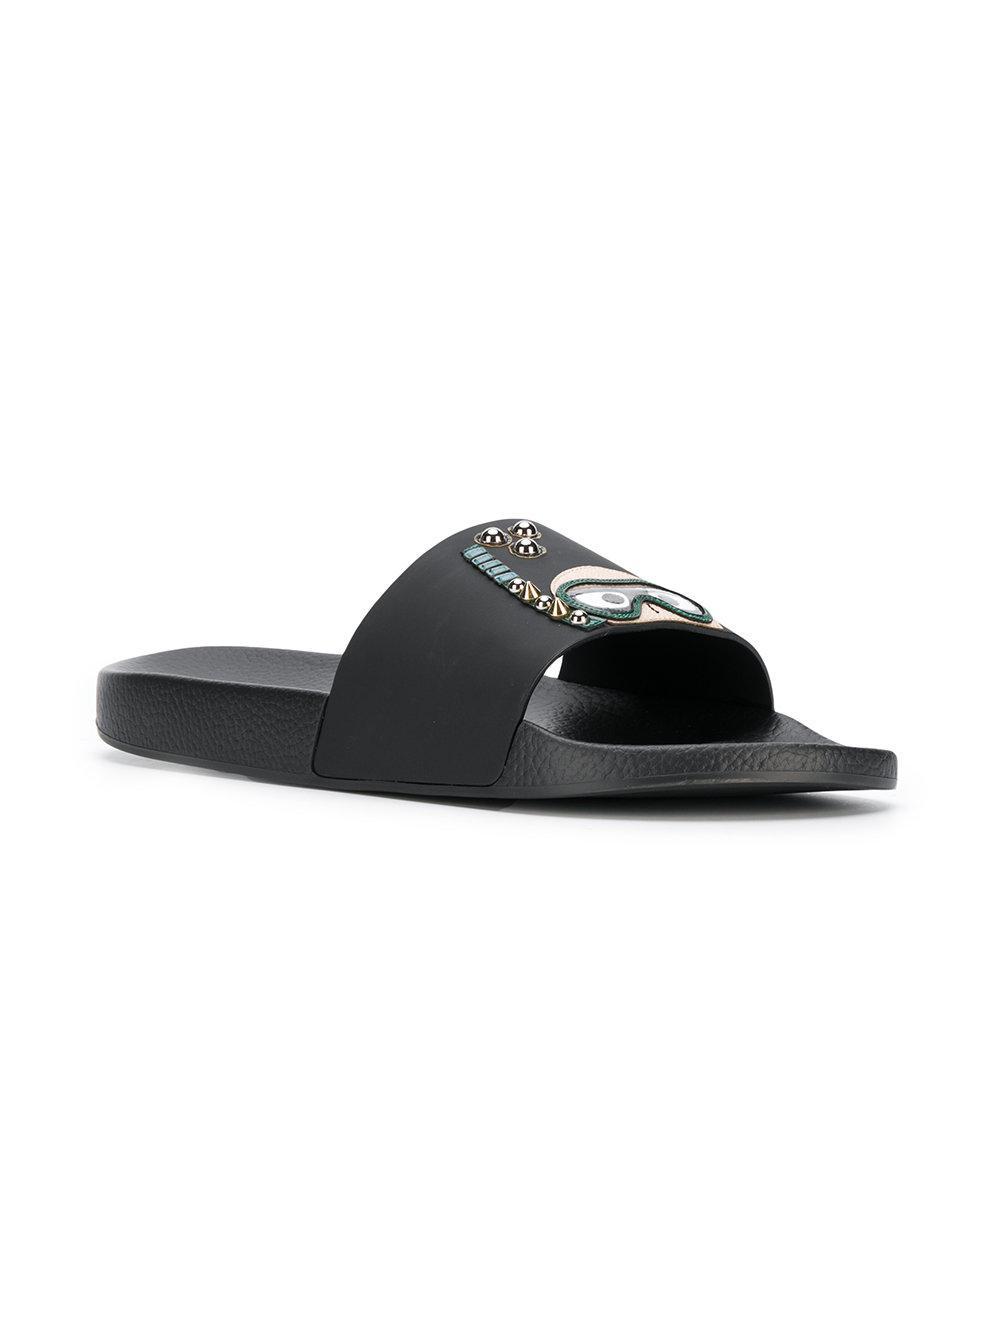 103b00c11 Lyst - Dolce   Gabbana St. Barth Sliders in Black for Men